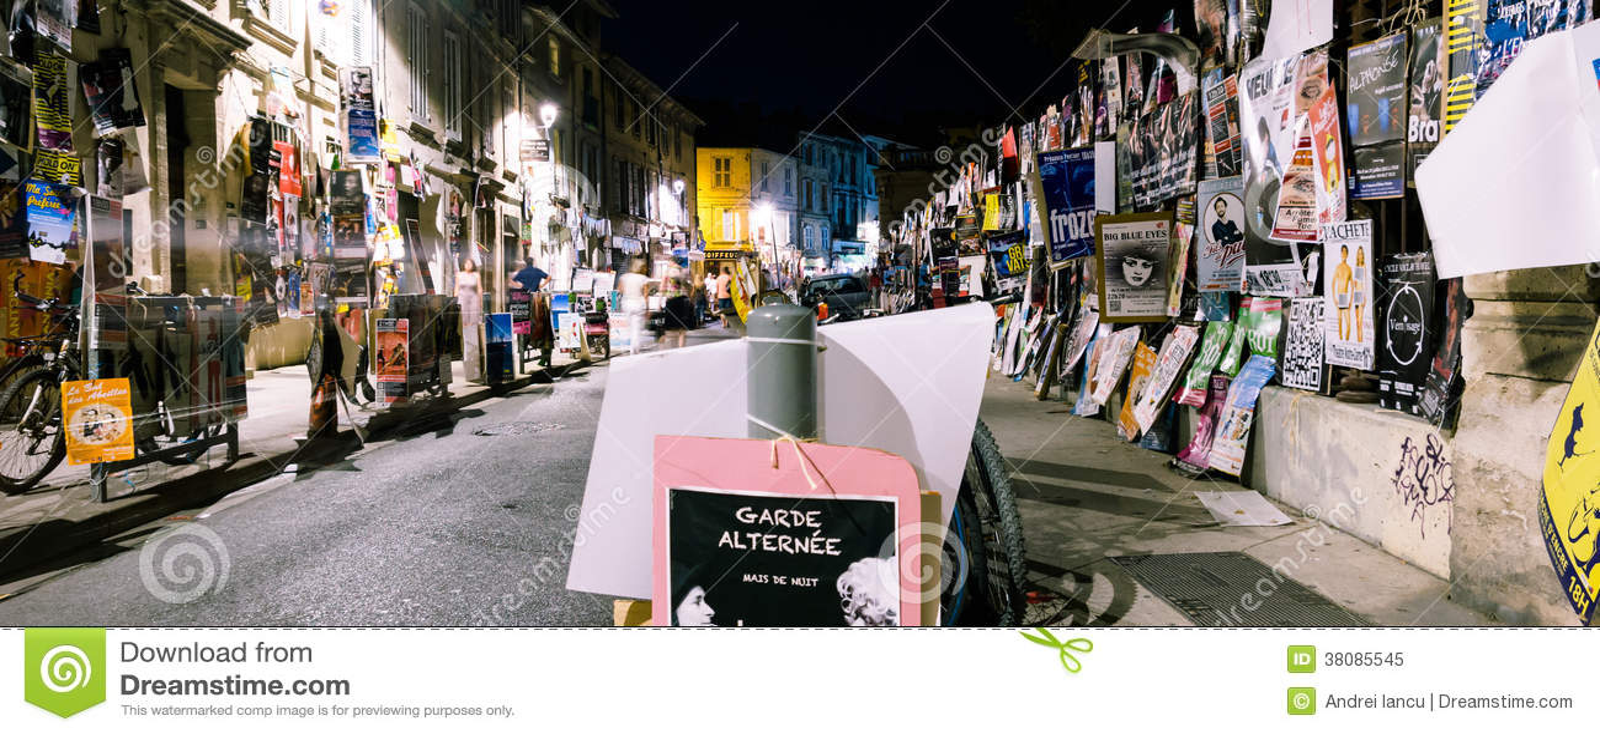 Avignon festival posters night